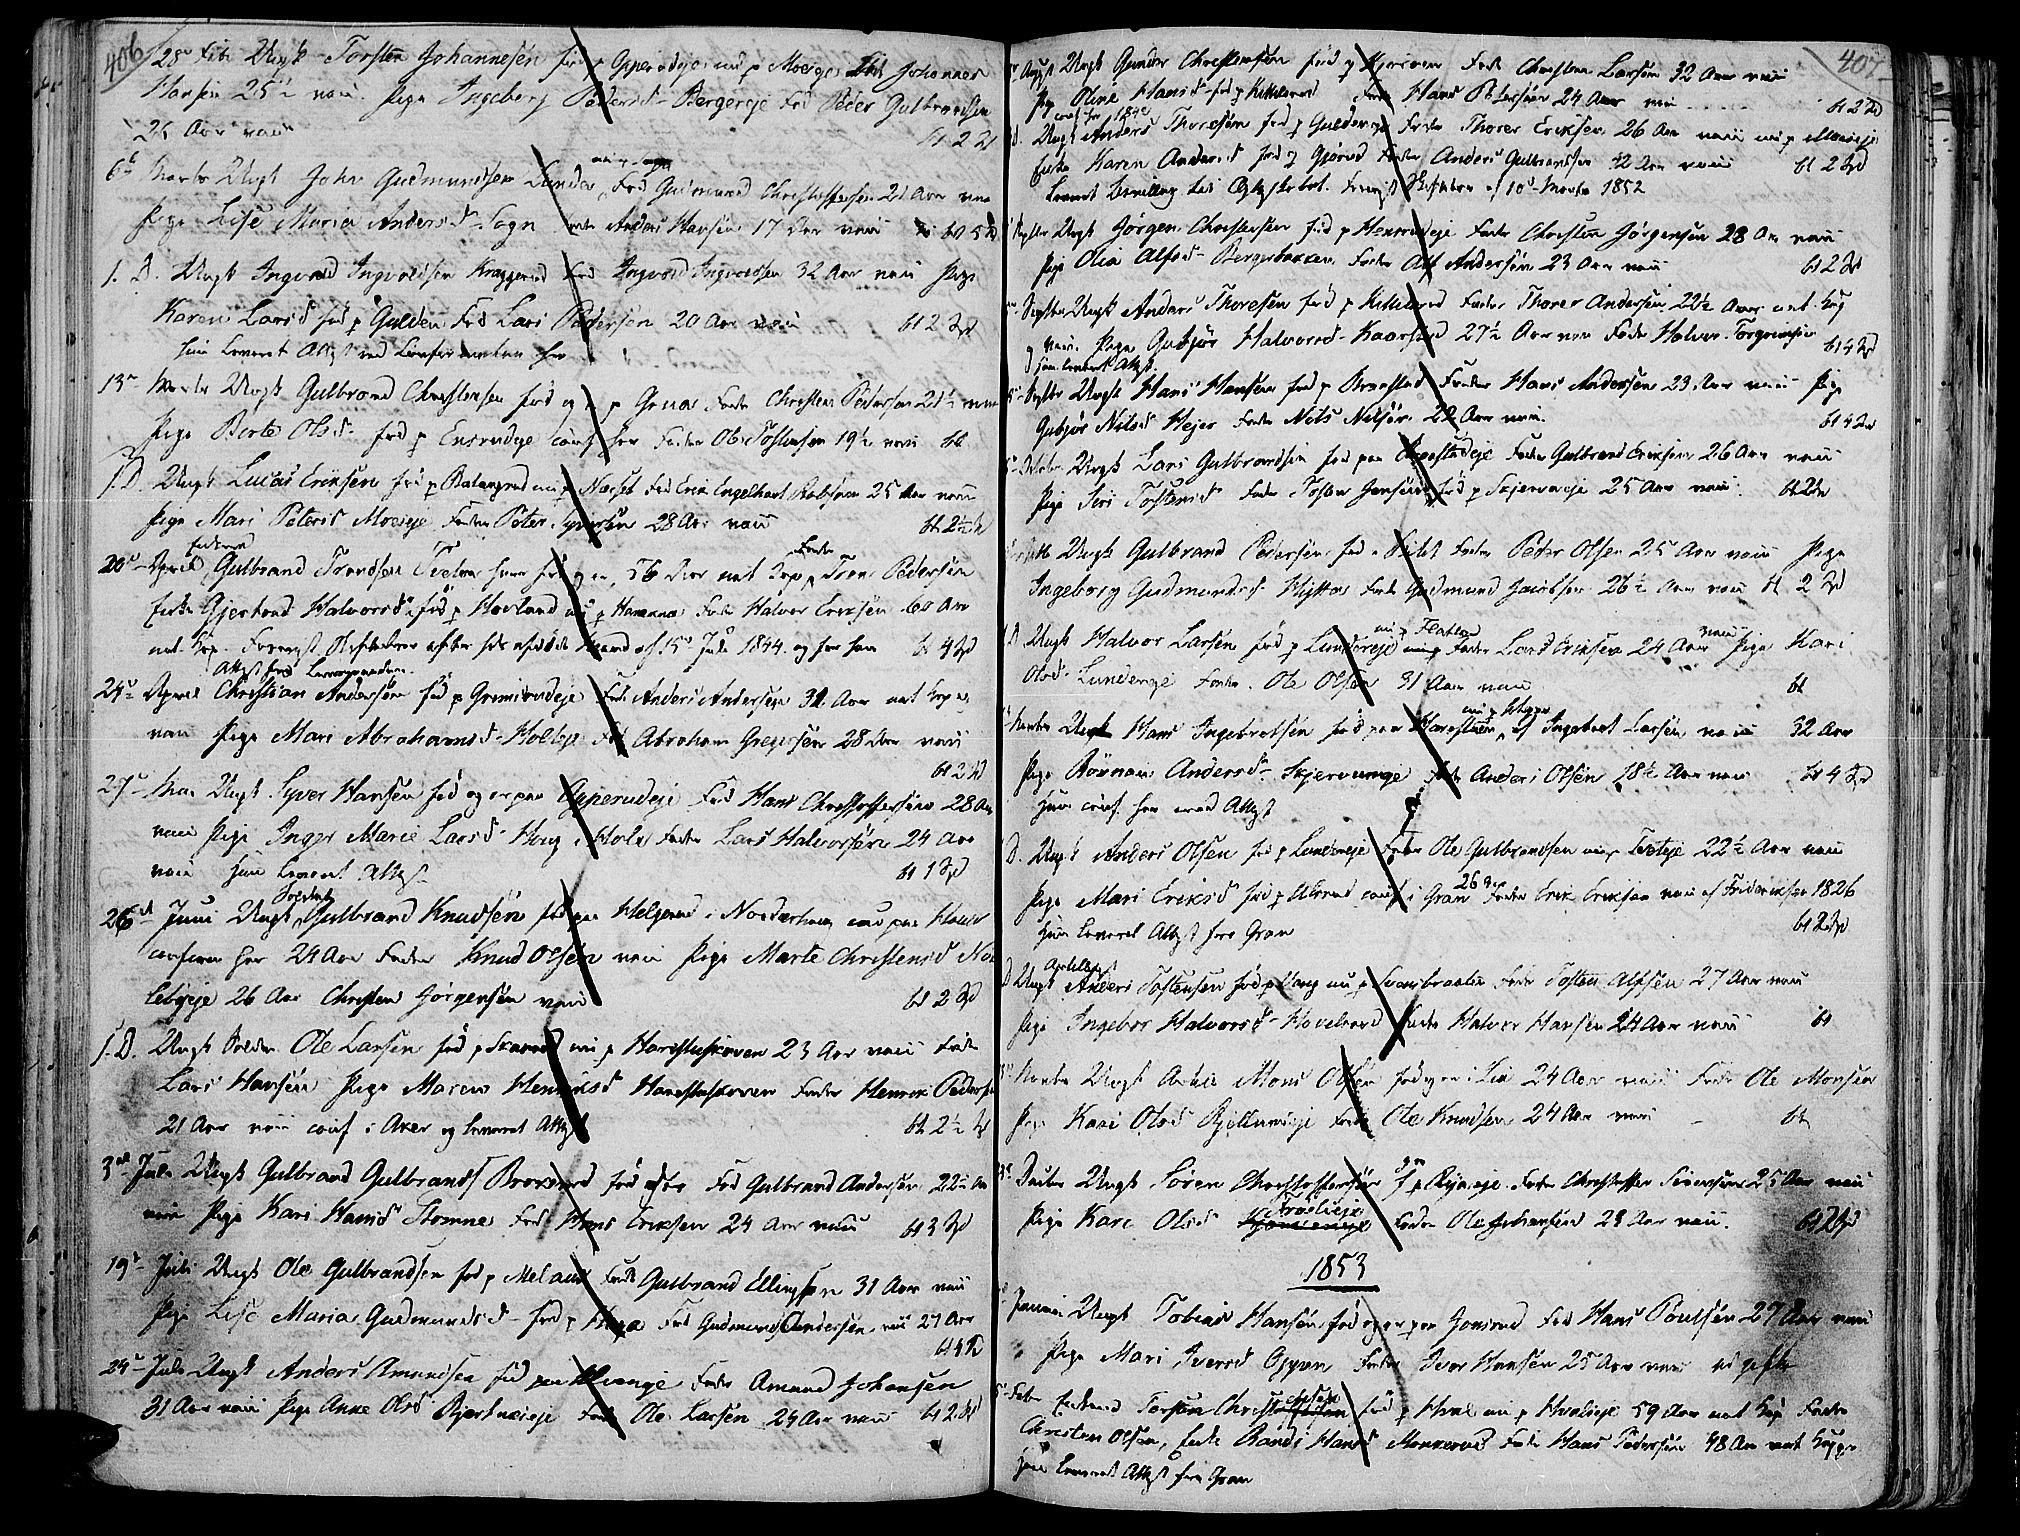 SAH, Jevnaker prestekontor, Ministerialbok nr. 4, 1800-1861, s. 406-407